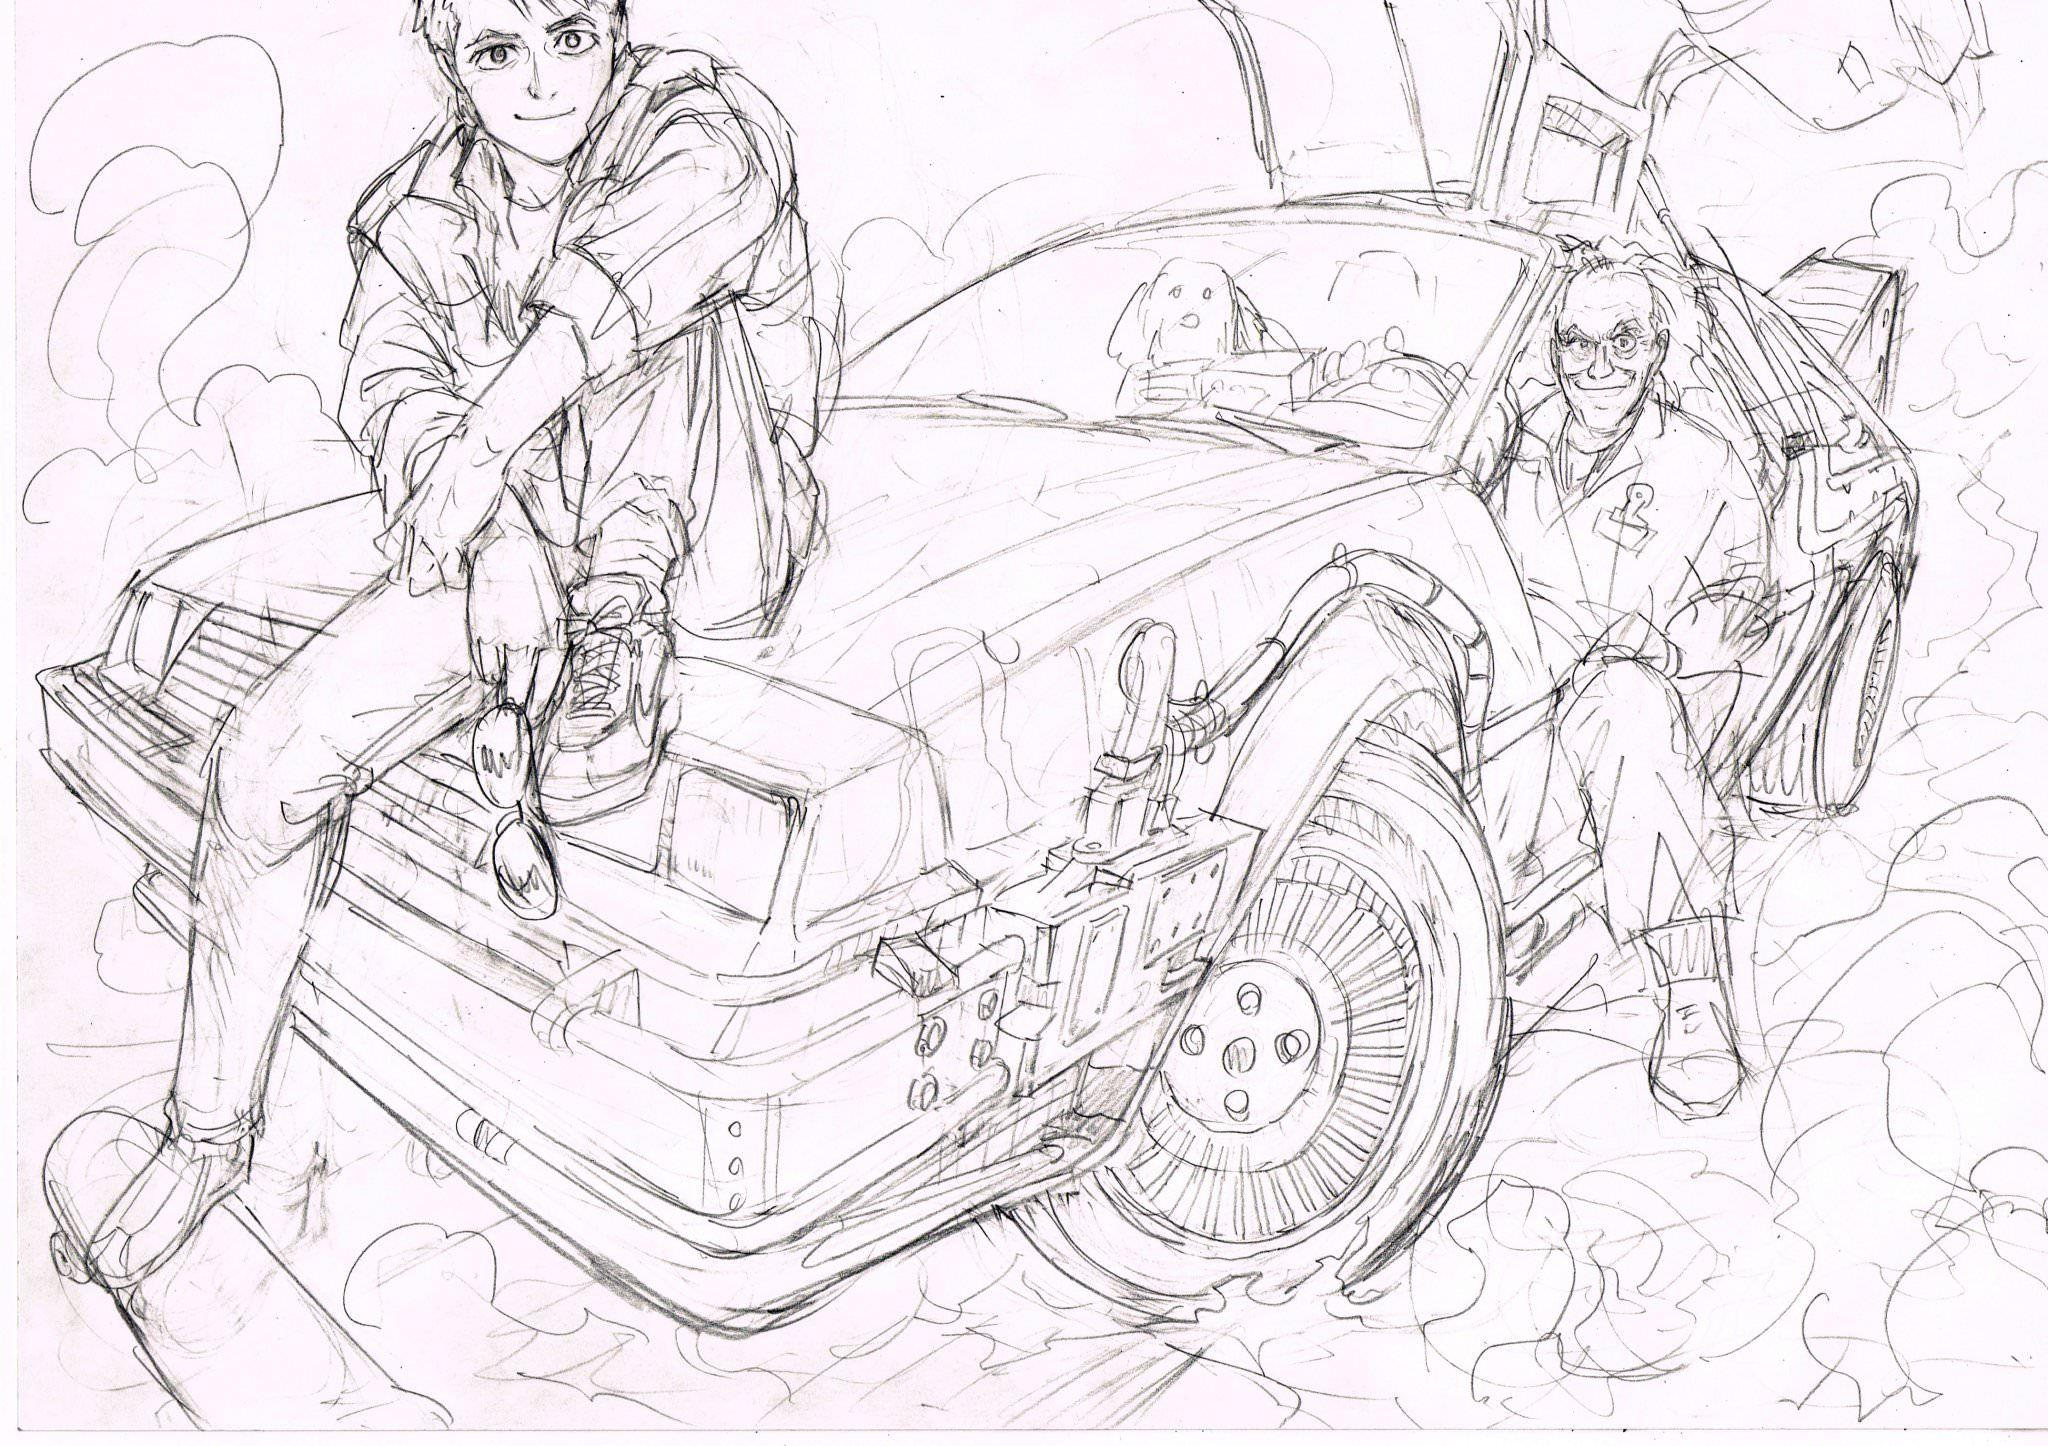 New Back To The Future Sketch By Yusuke Murata Desenho Anime Manga